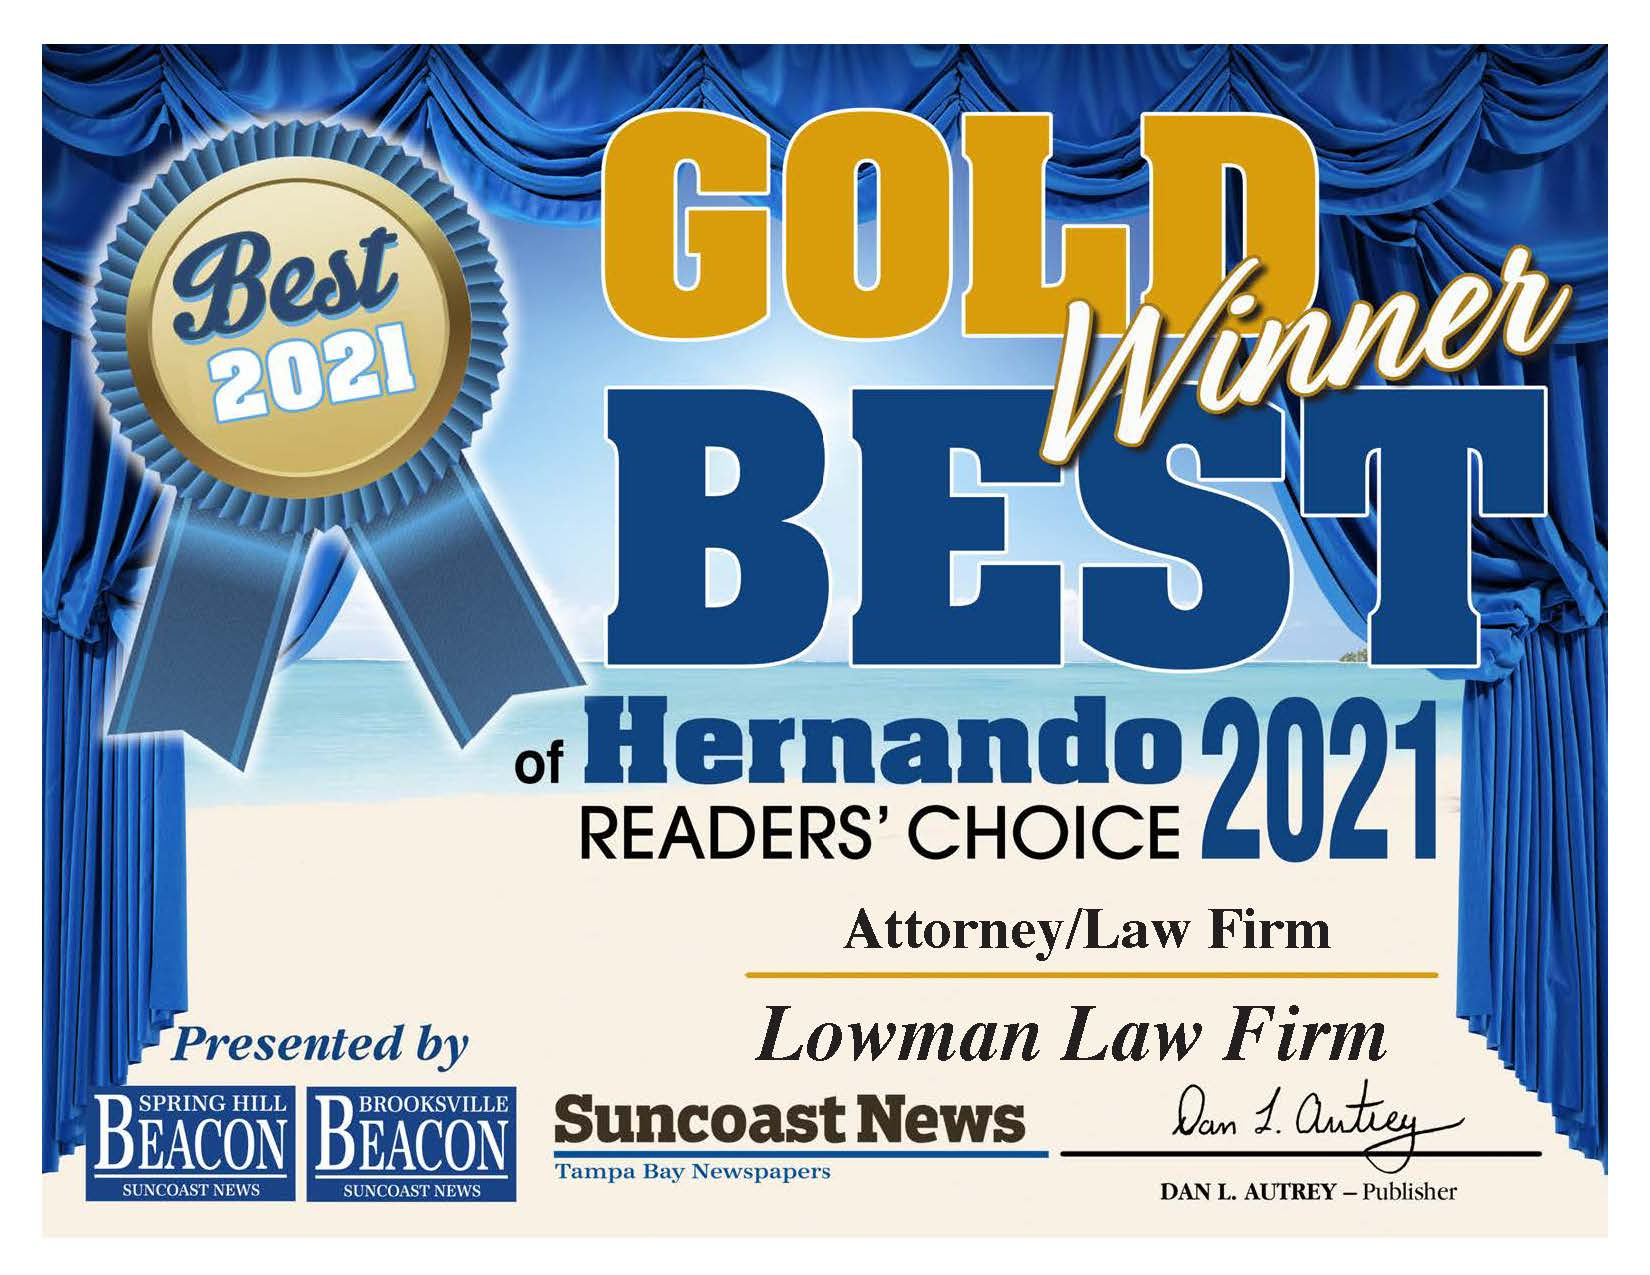 LOWMAN BEST OF HERNANDO